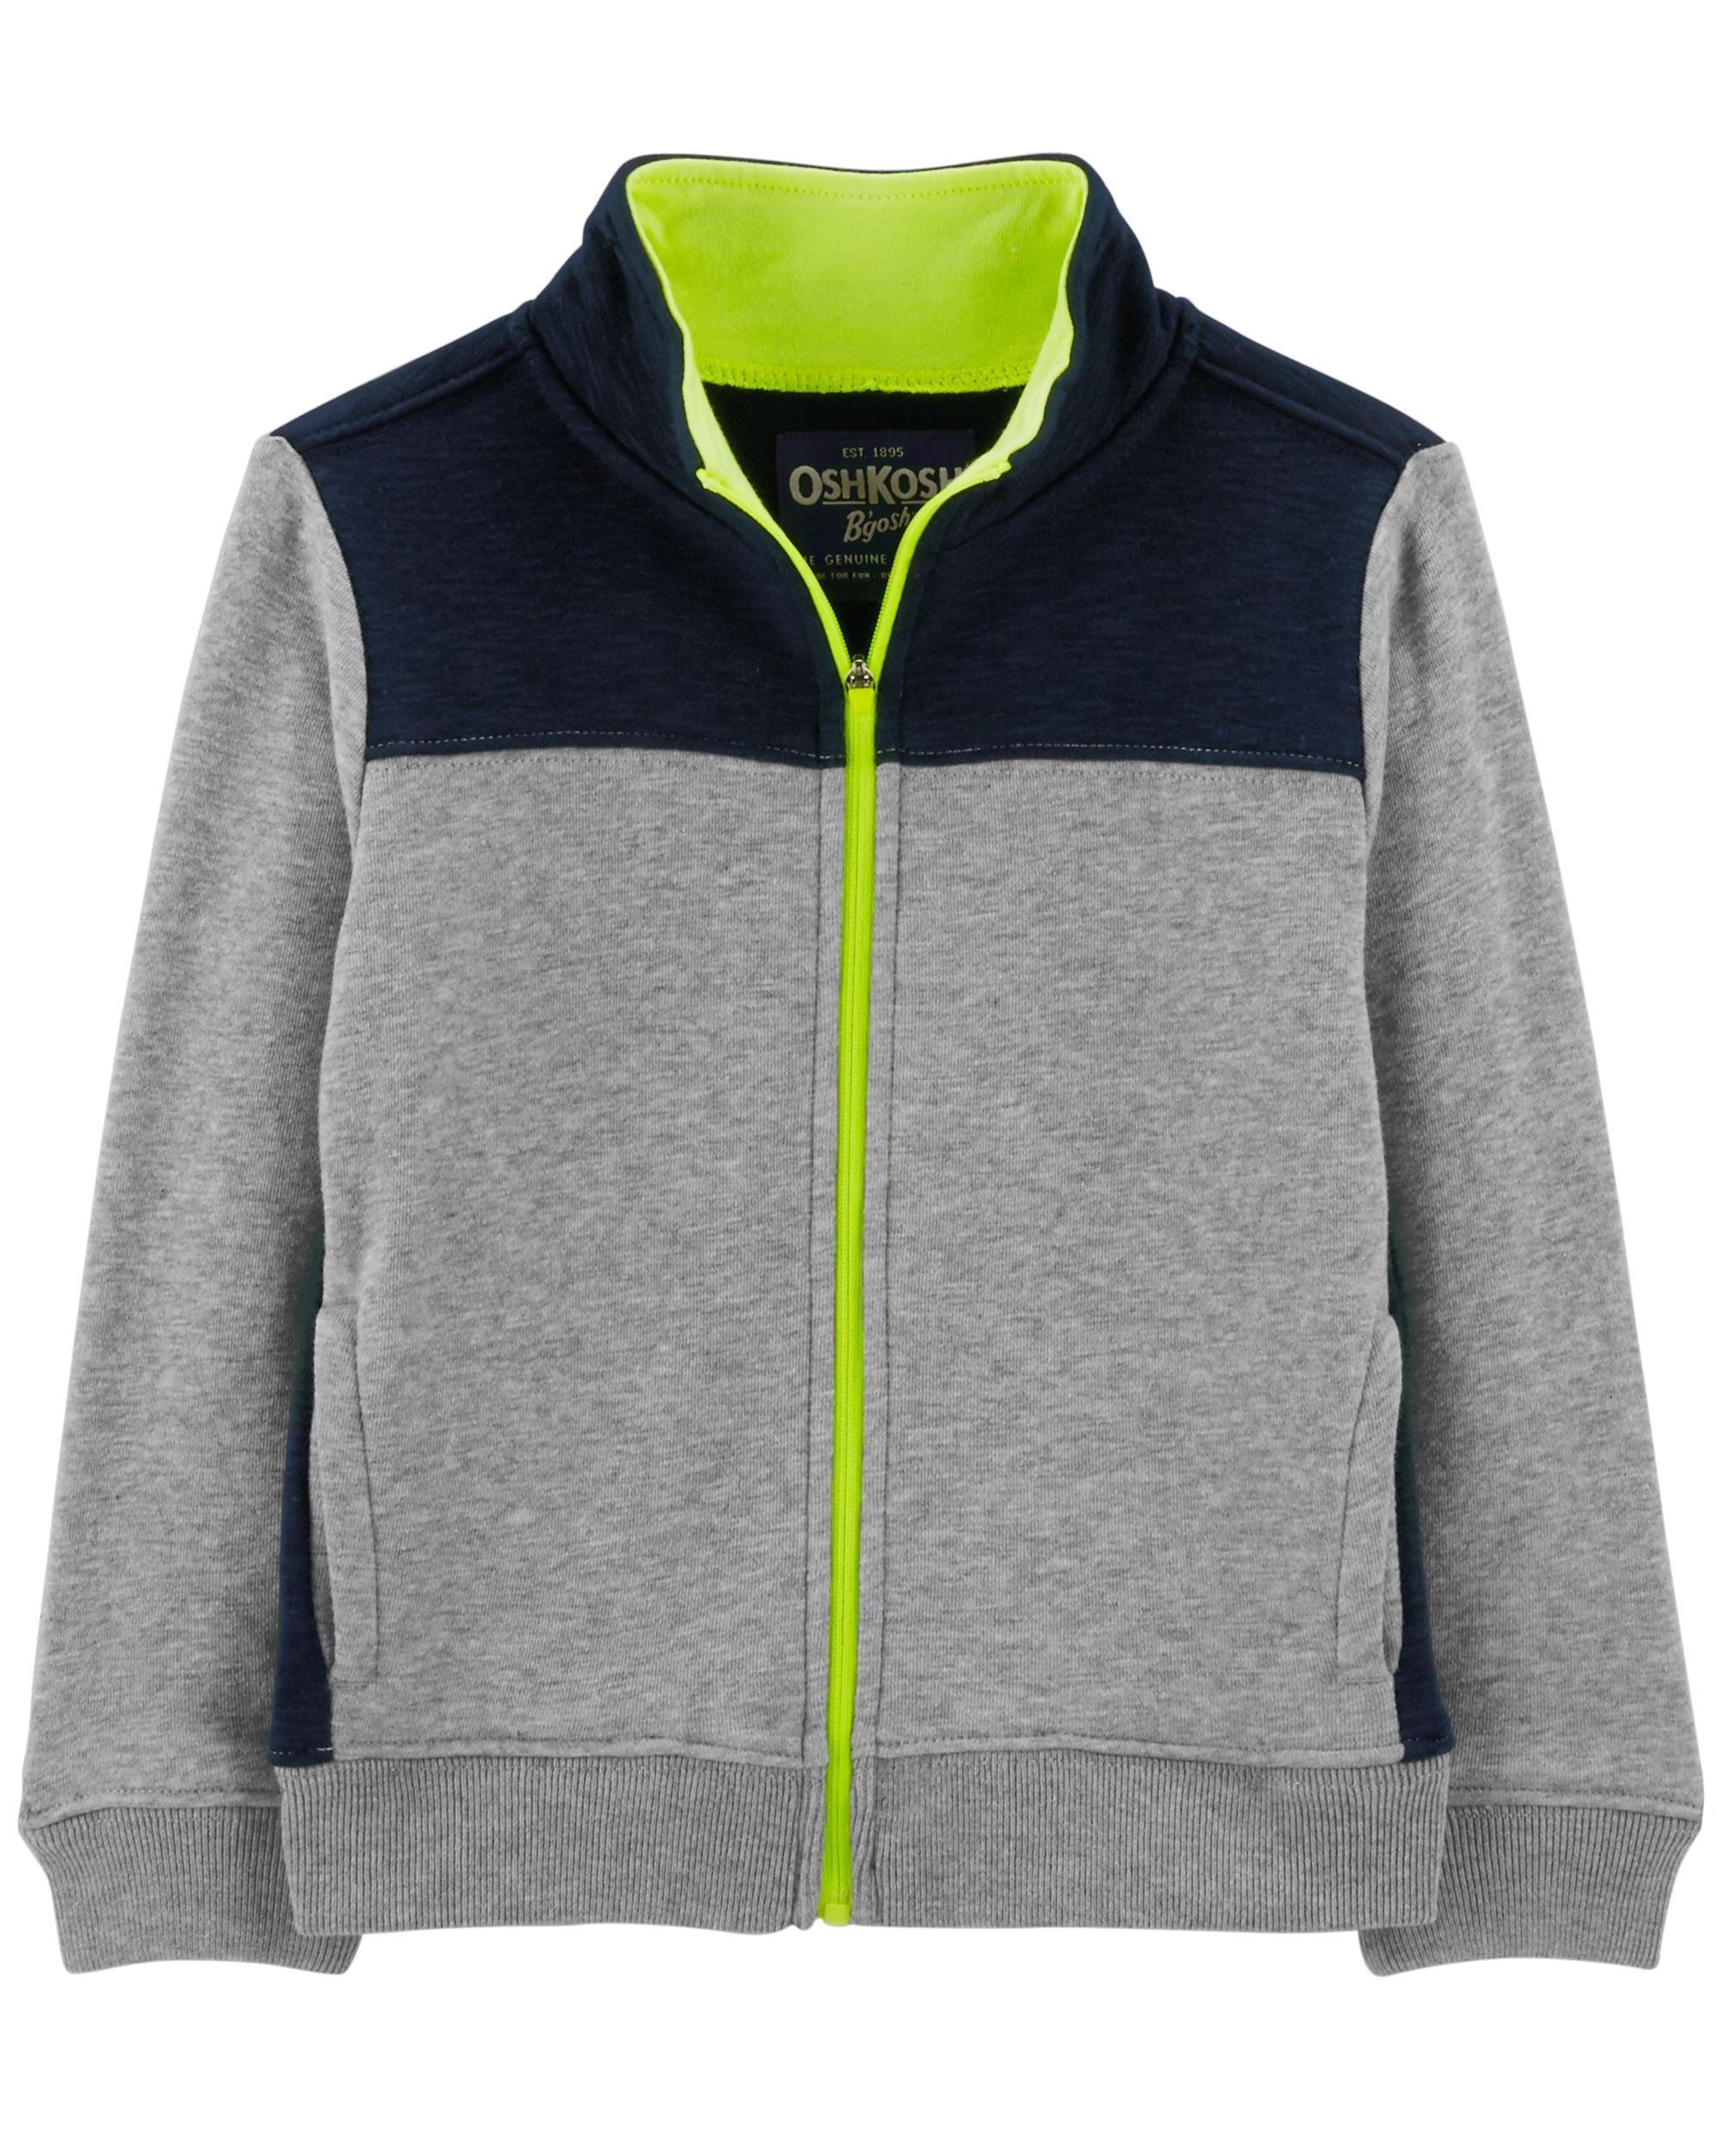 Toddler Boy Colorblock Active Jacket Oshkosh Com Boy Outerwear Fall Activewear Toddler Boys [ 2500 x 2000 Pixel ]